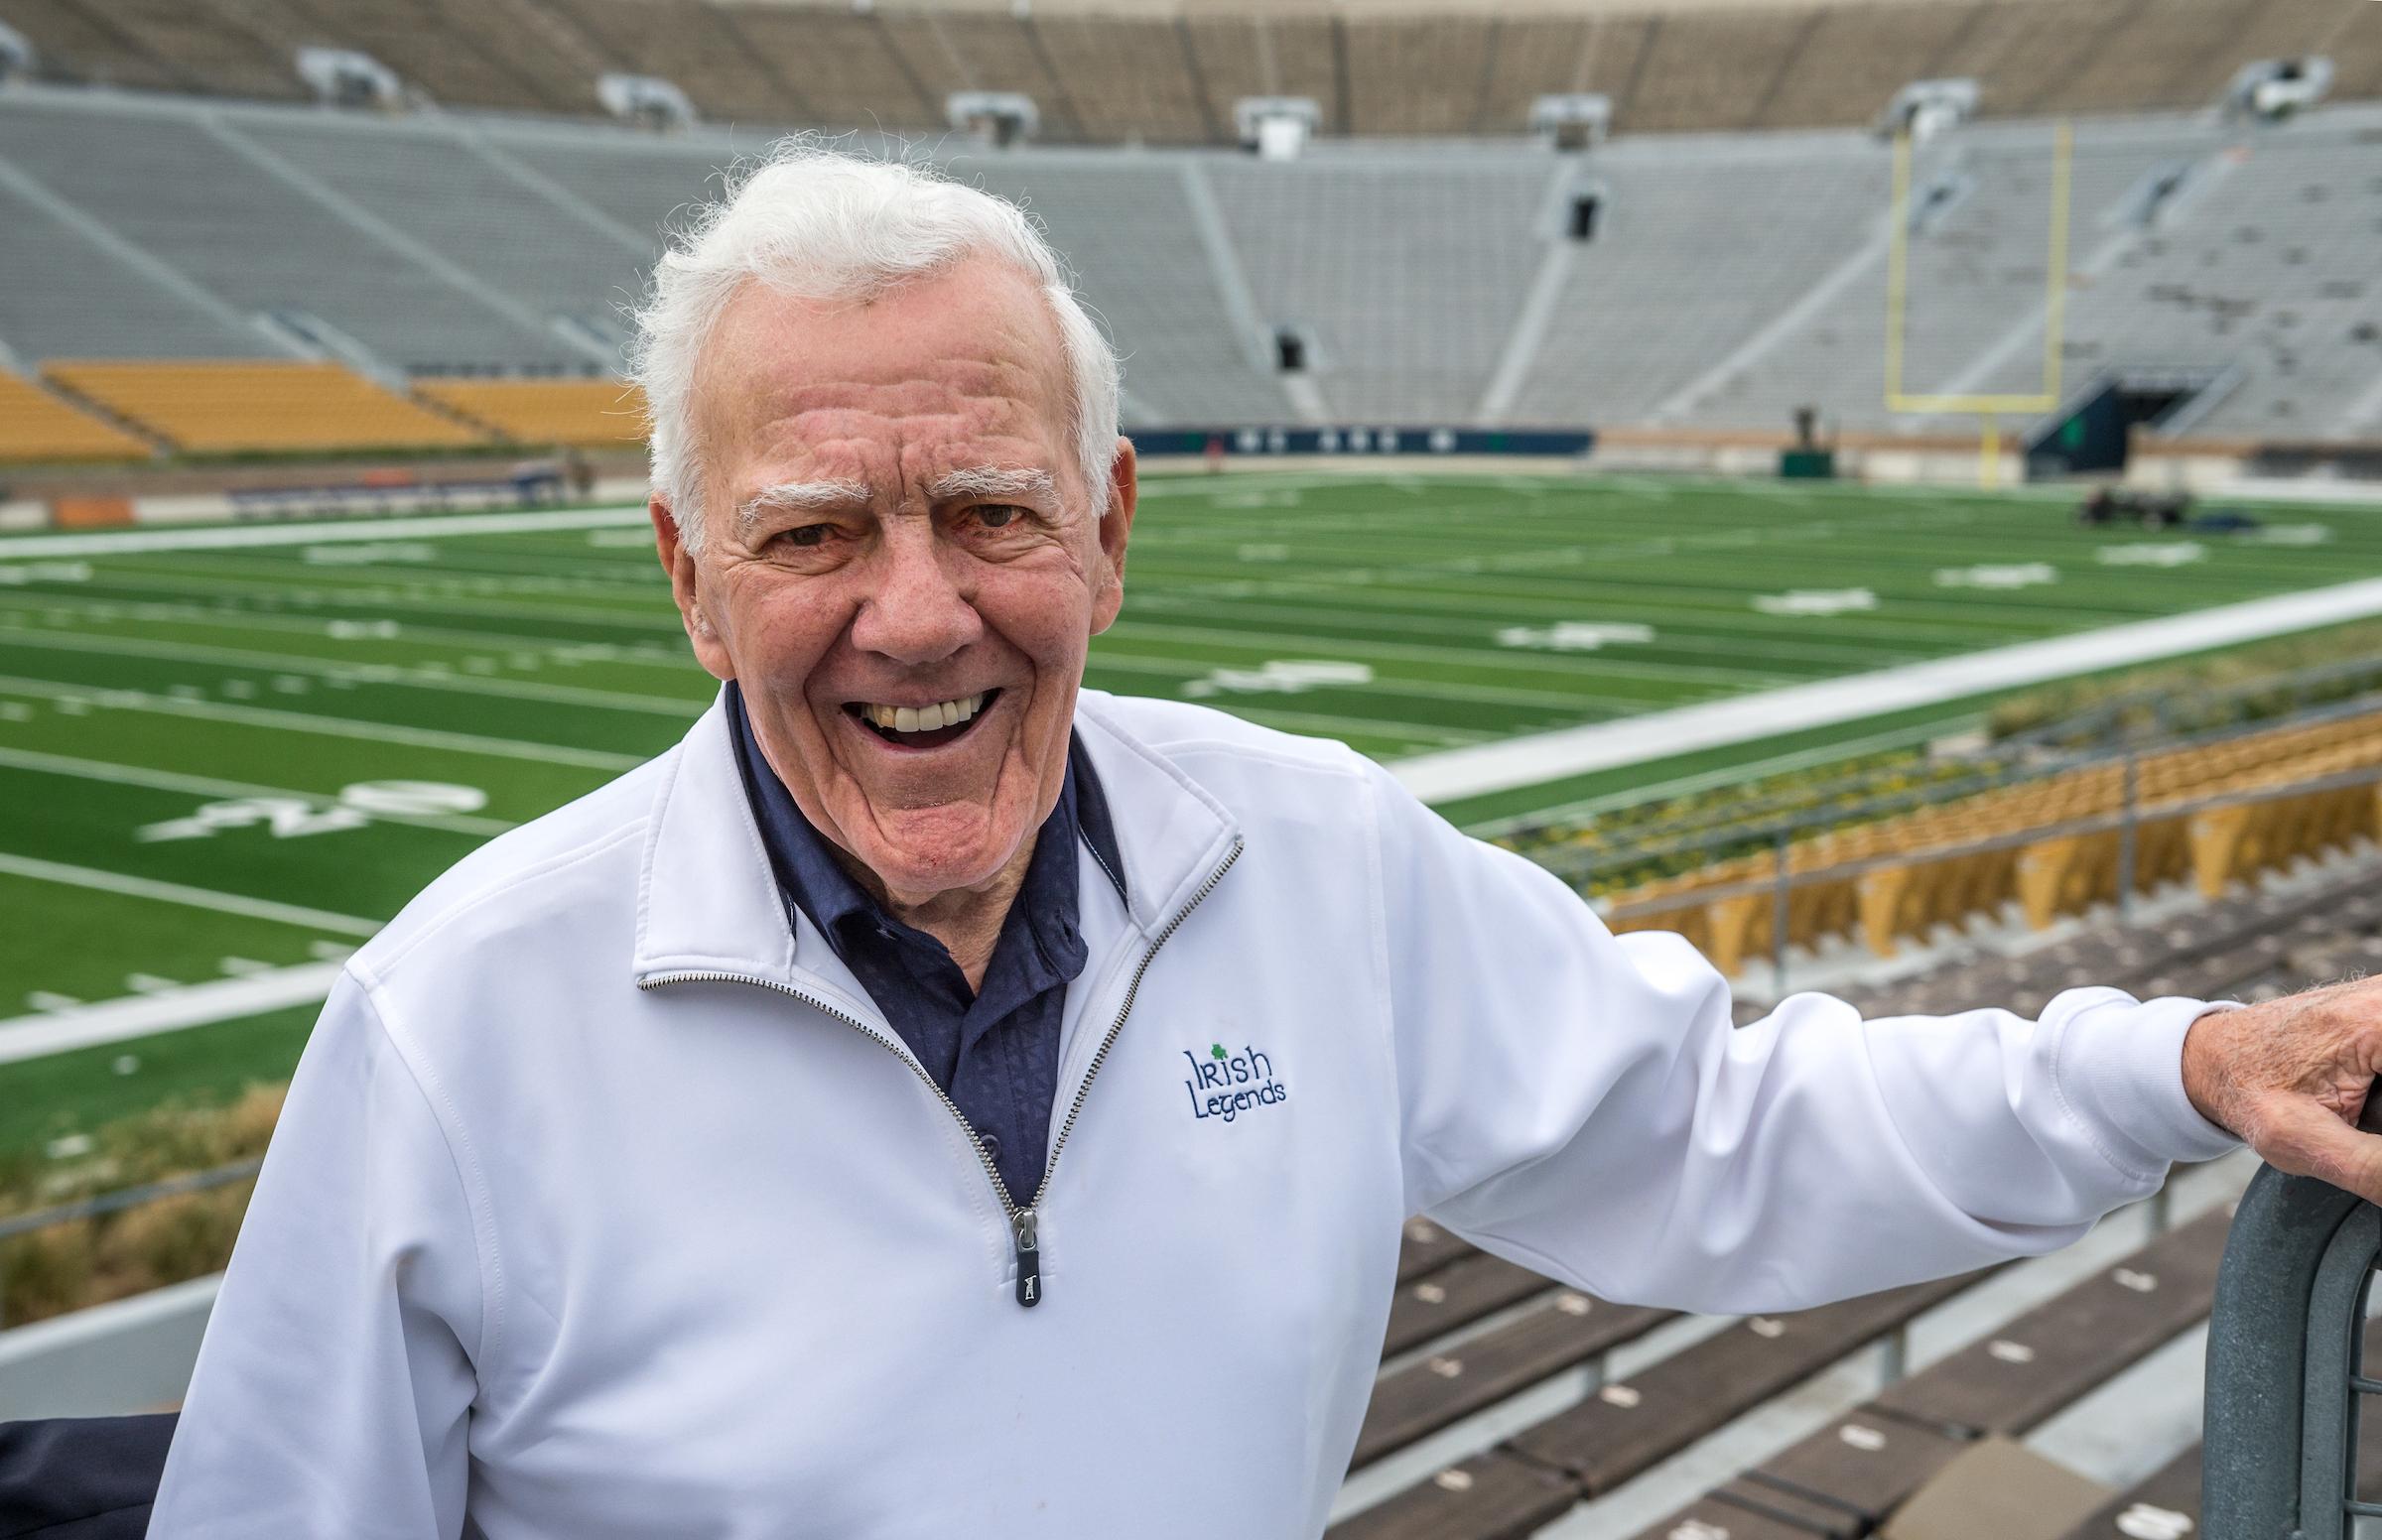 1641d583ad3 Former Notre Dame coach Ara Parseghian dies at age 94 | News | Notre ...